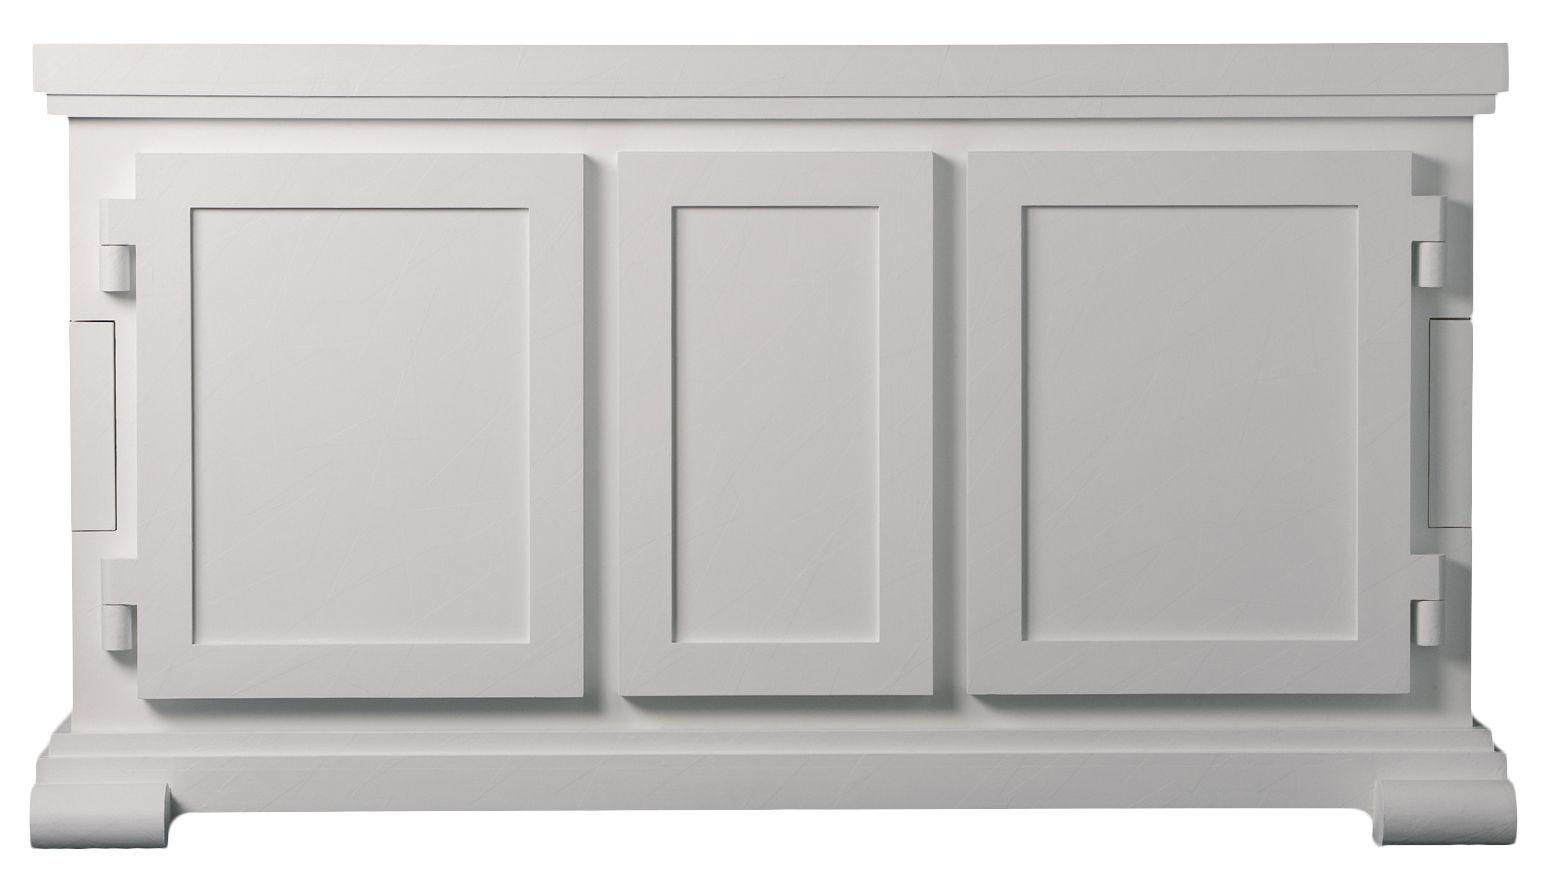 Furniture - Dressers & Storage Units - Paper Dresser by Moooi - White - Cardboard, Paper